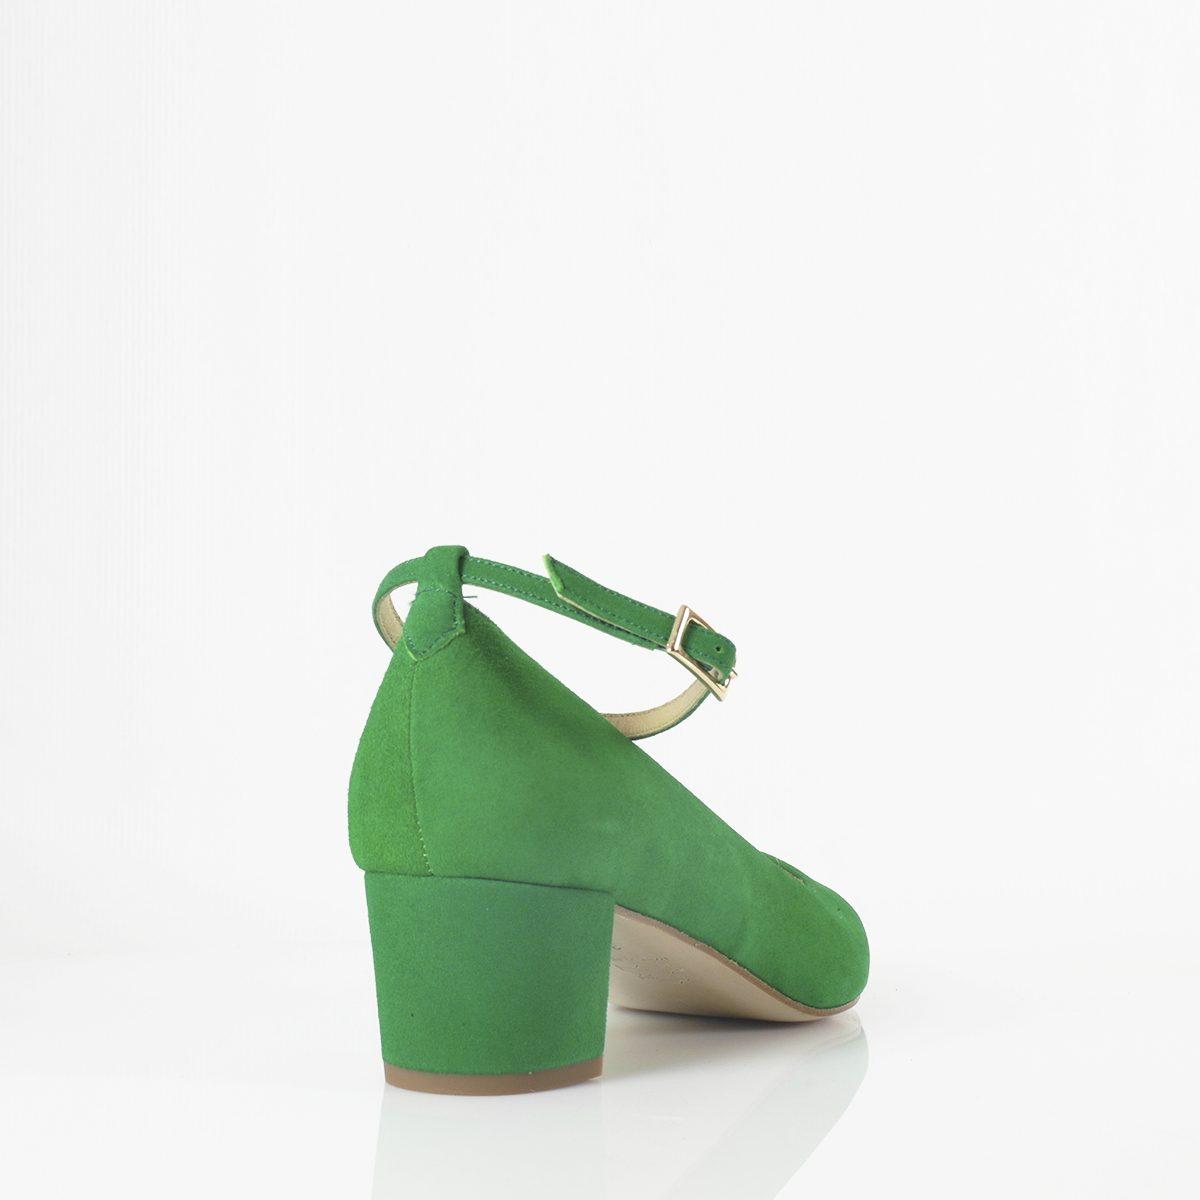 SALON MOD.1833 (4cm) - Zapatos personalizados fiesta